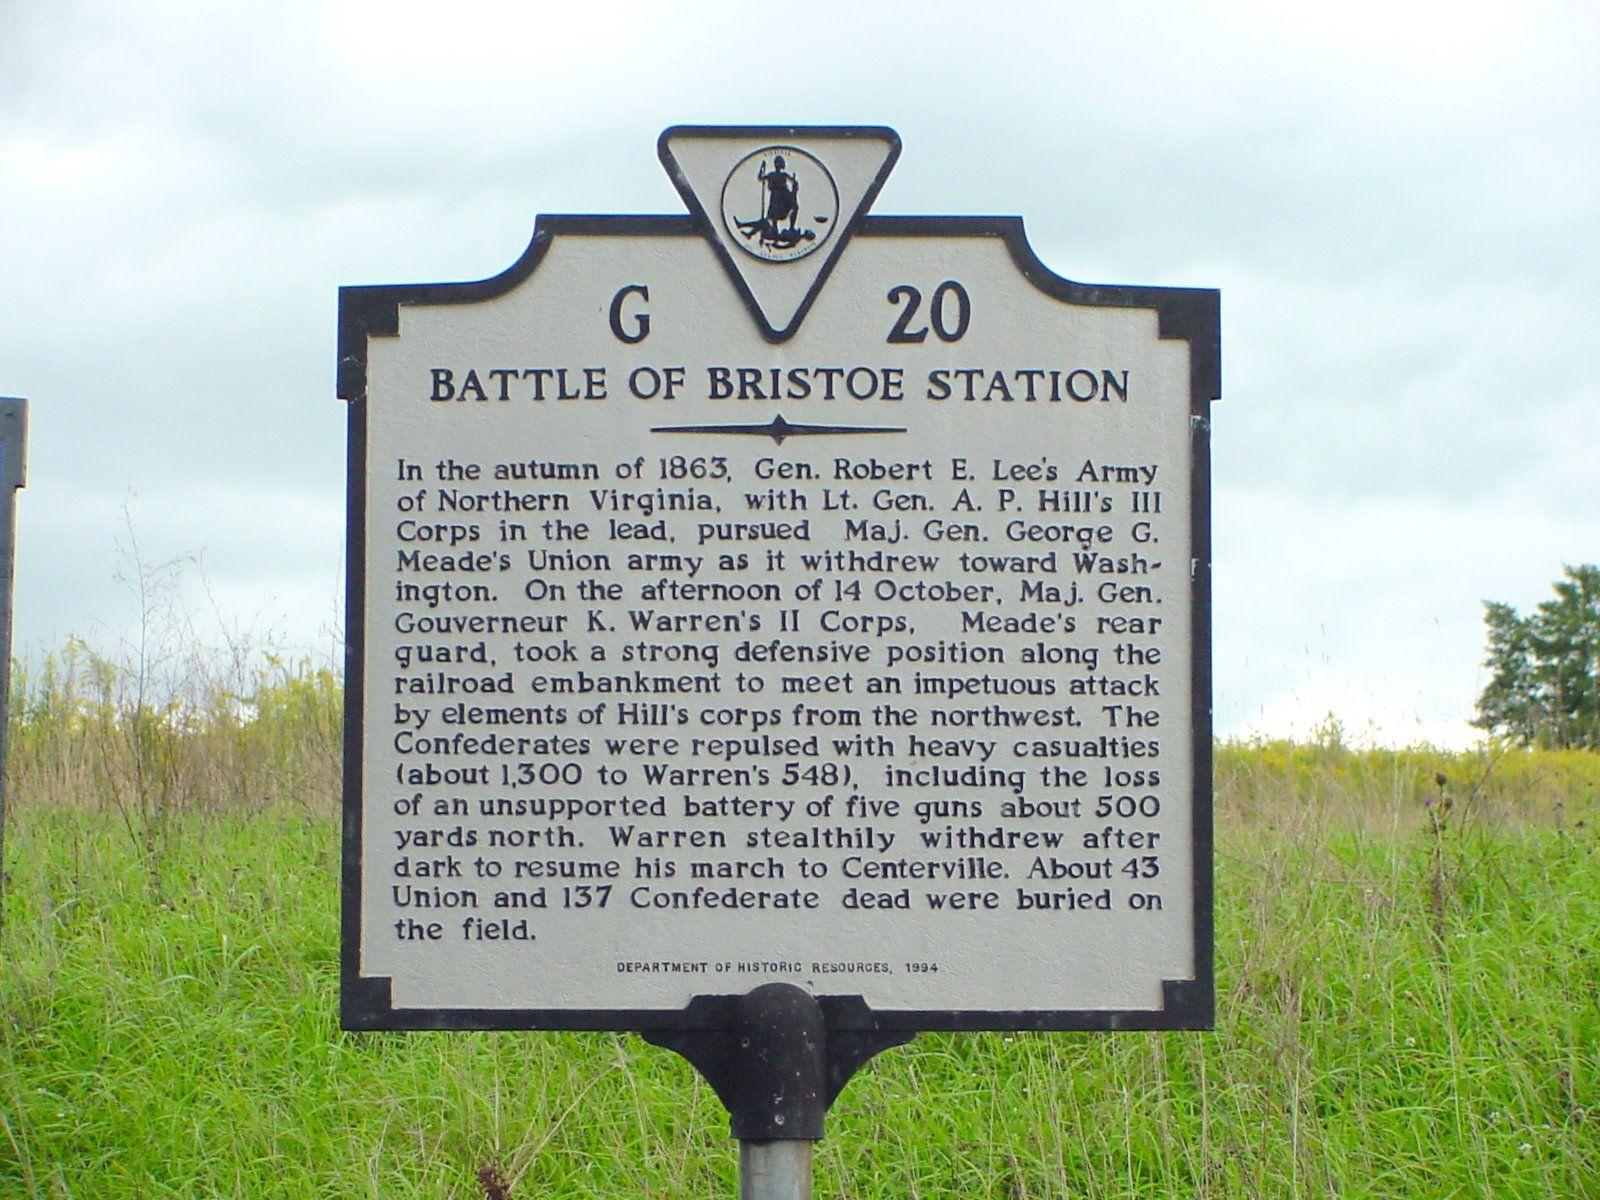 Battle of Bristoe Station Marker